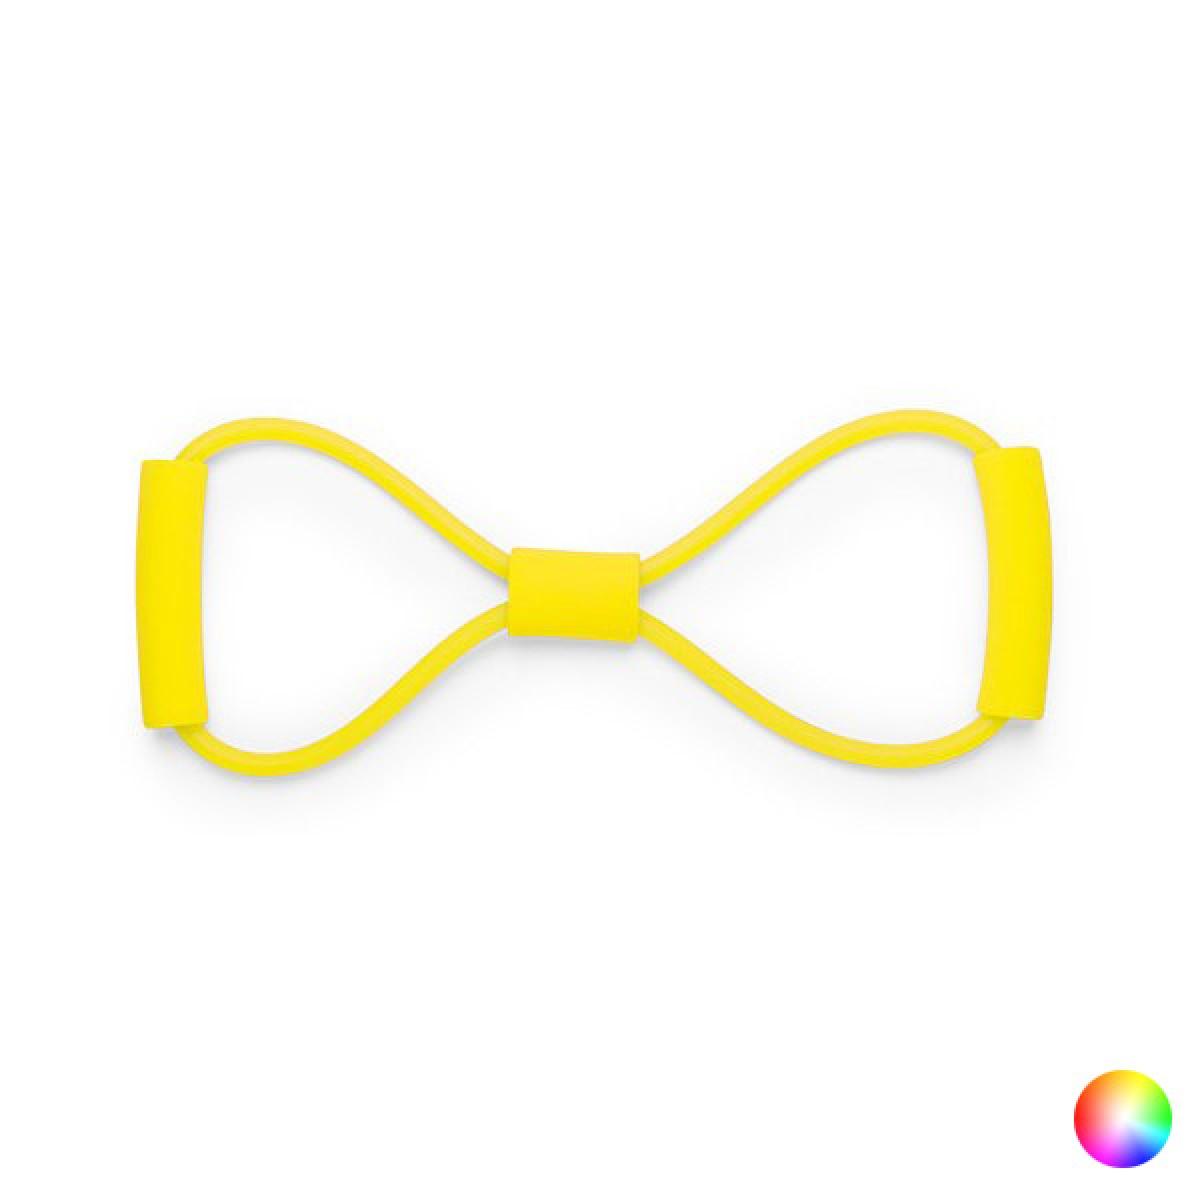 704d4672 Elastisk hårband til gymnastik 144806 - Farve: Gul